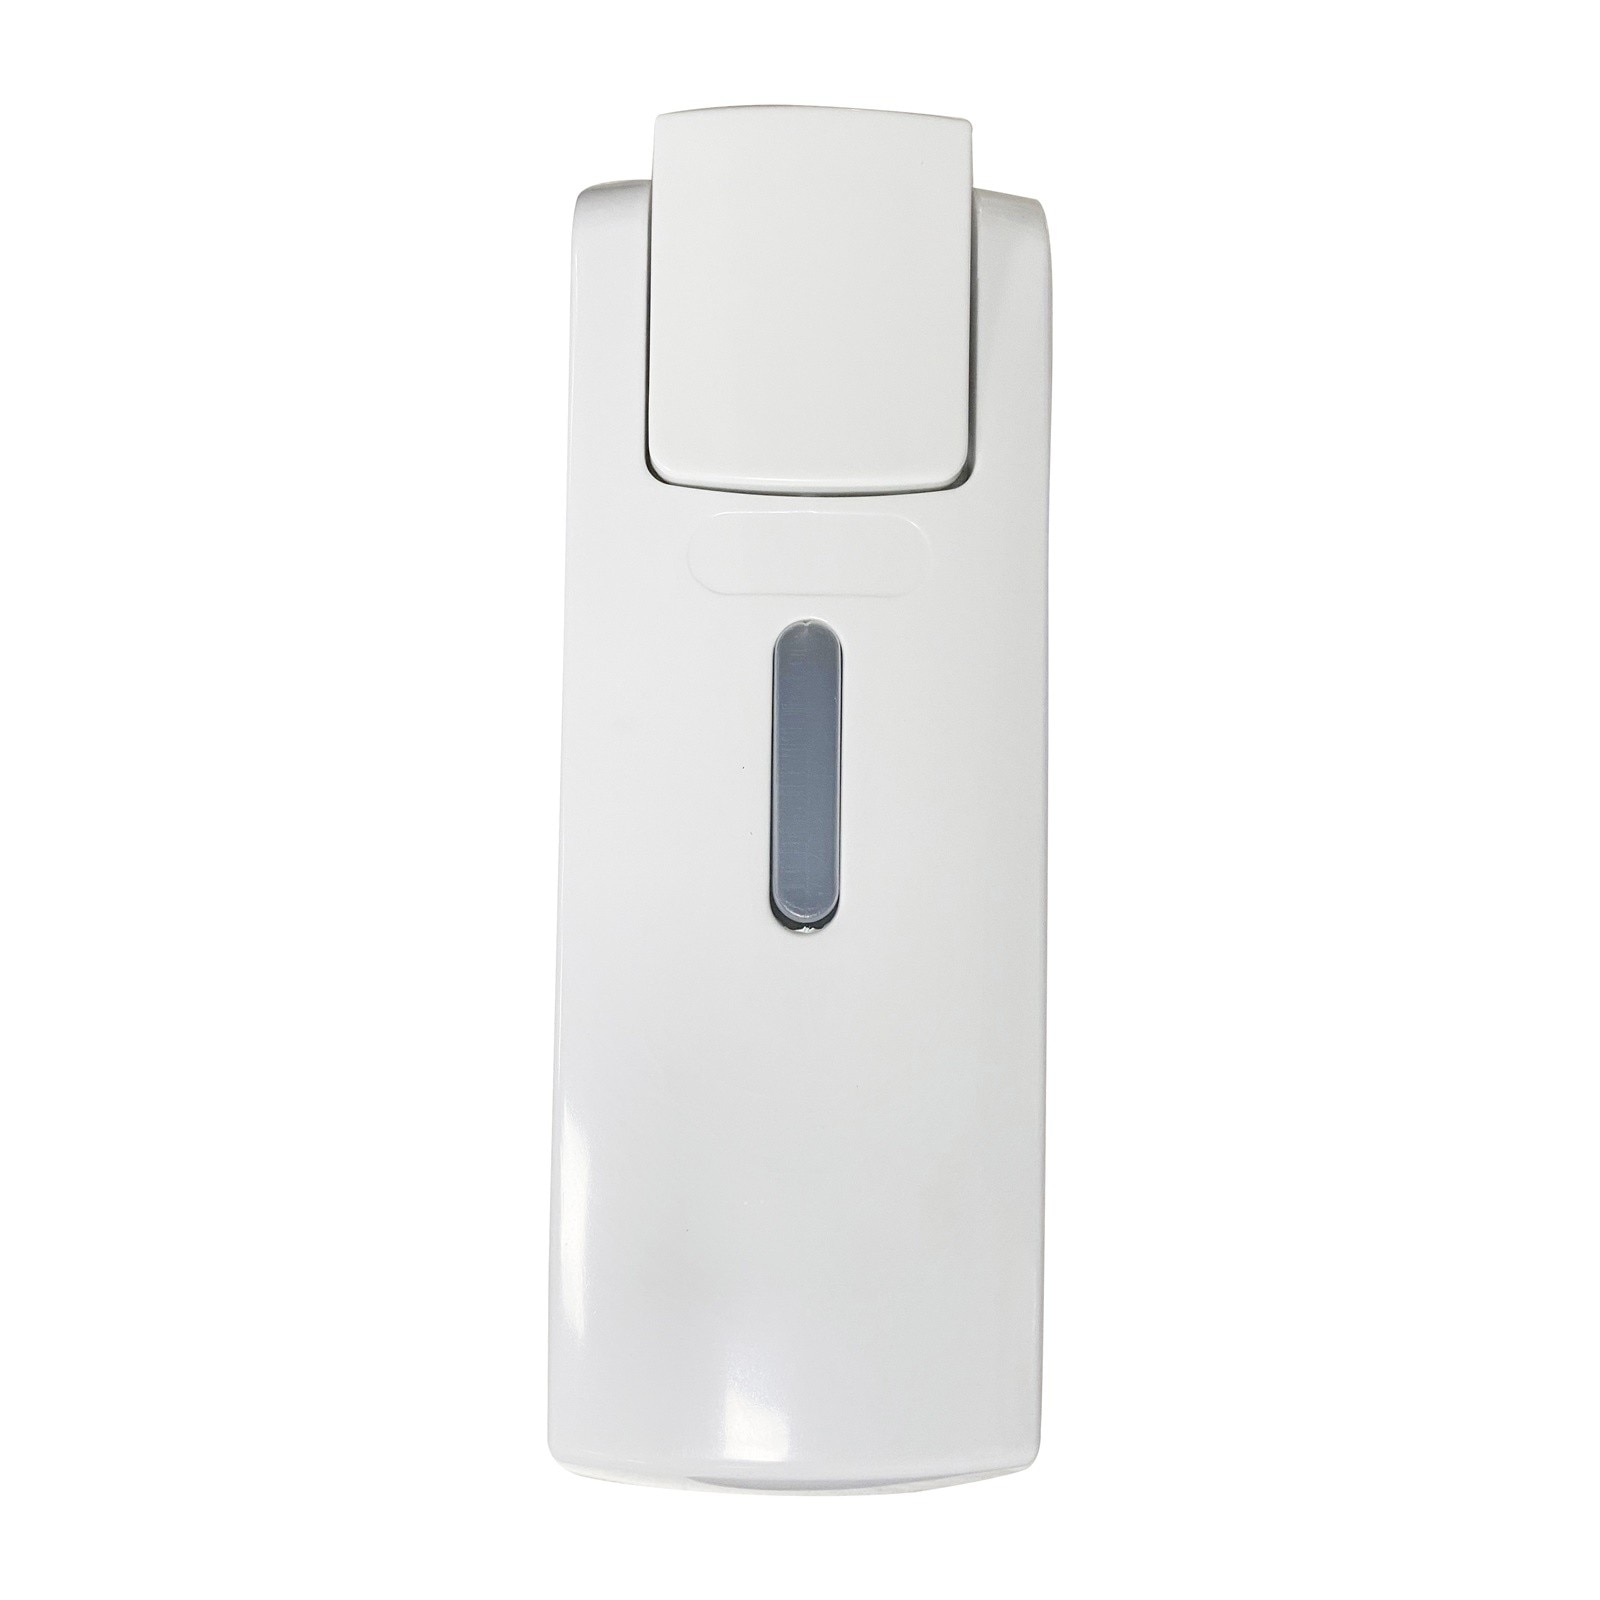 Prensa de accesorio de cocina, distribuidor de jabón Dispensador De jabón para...